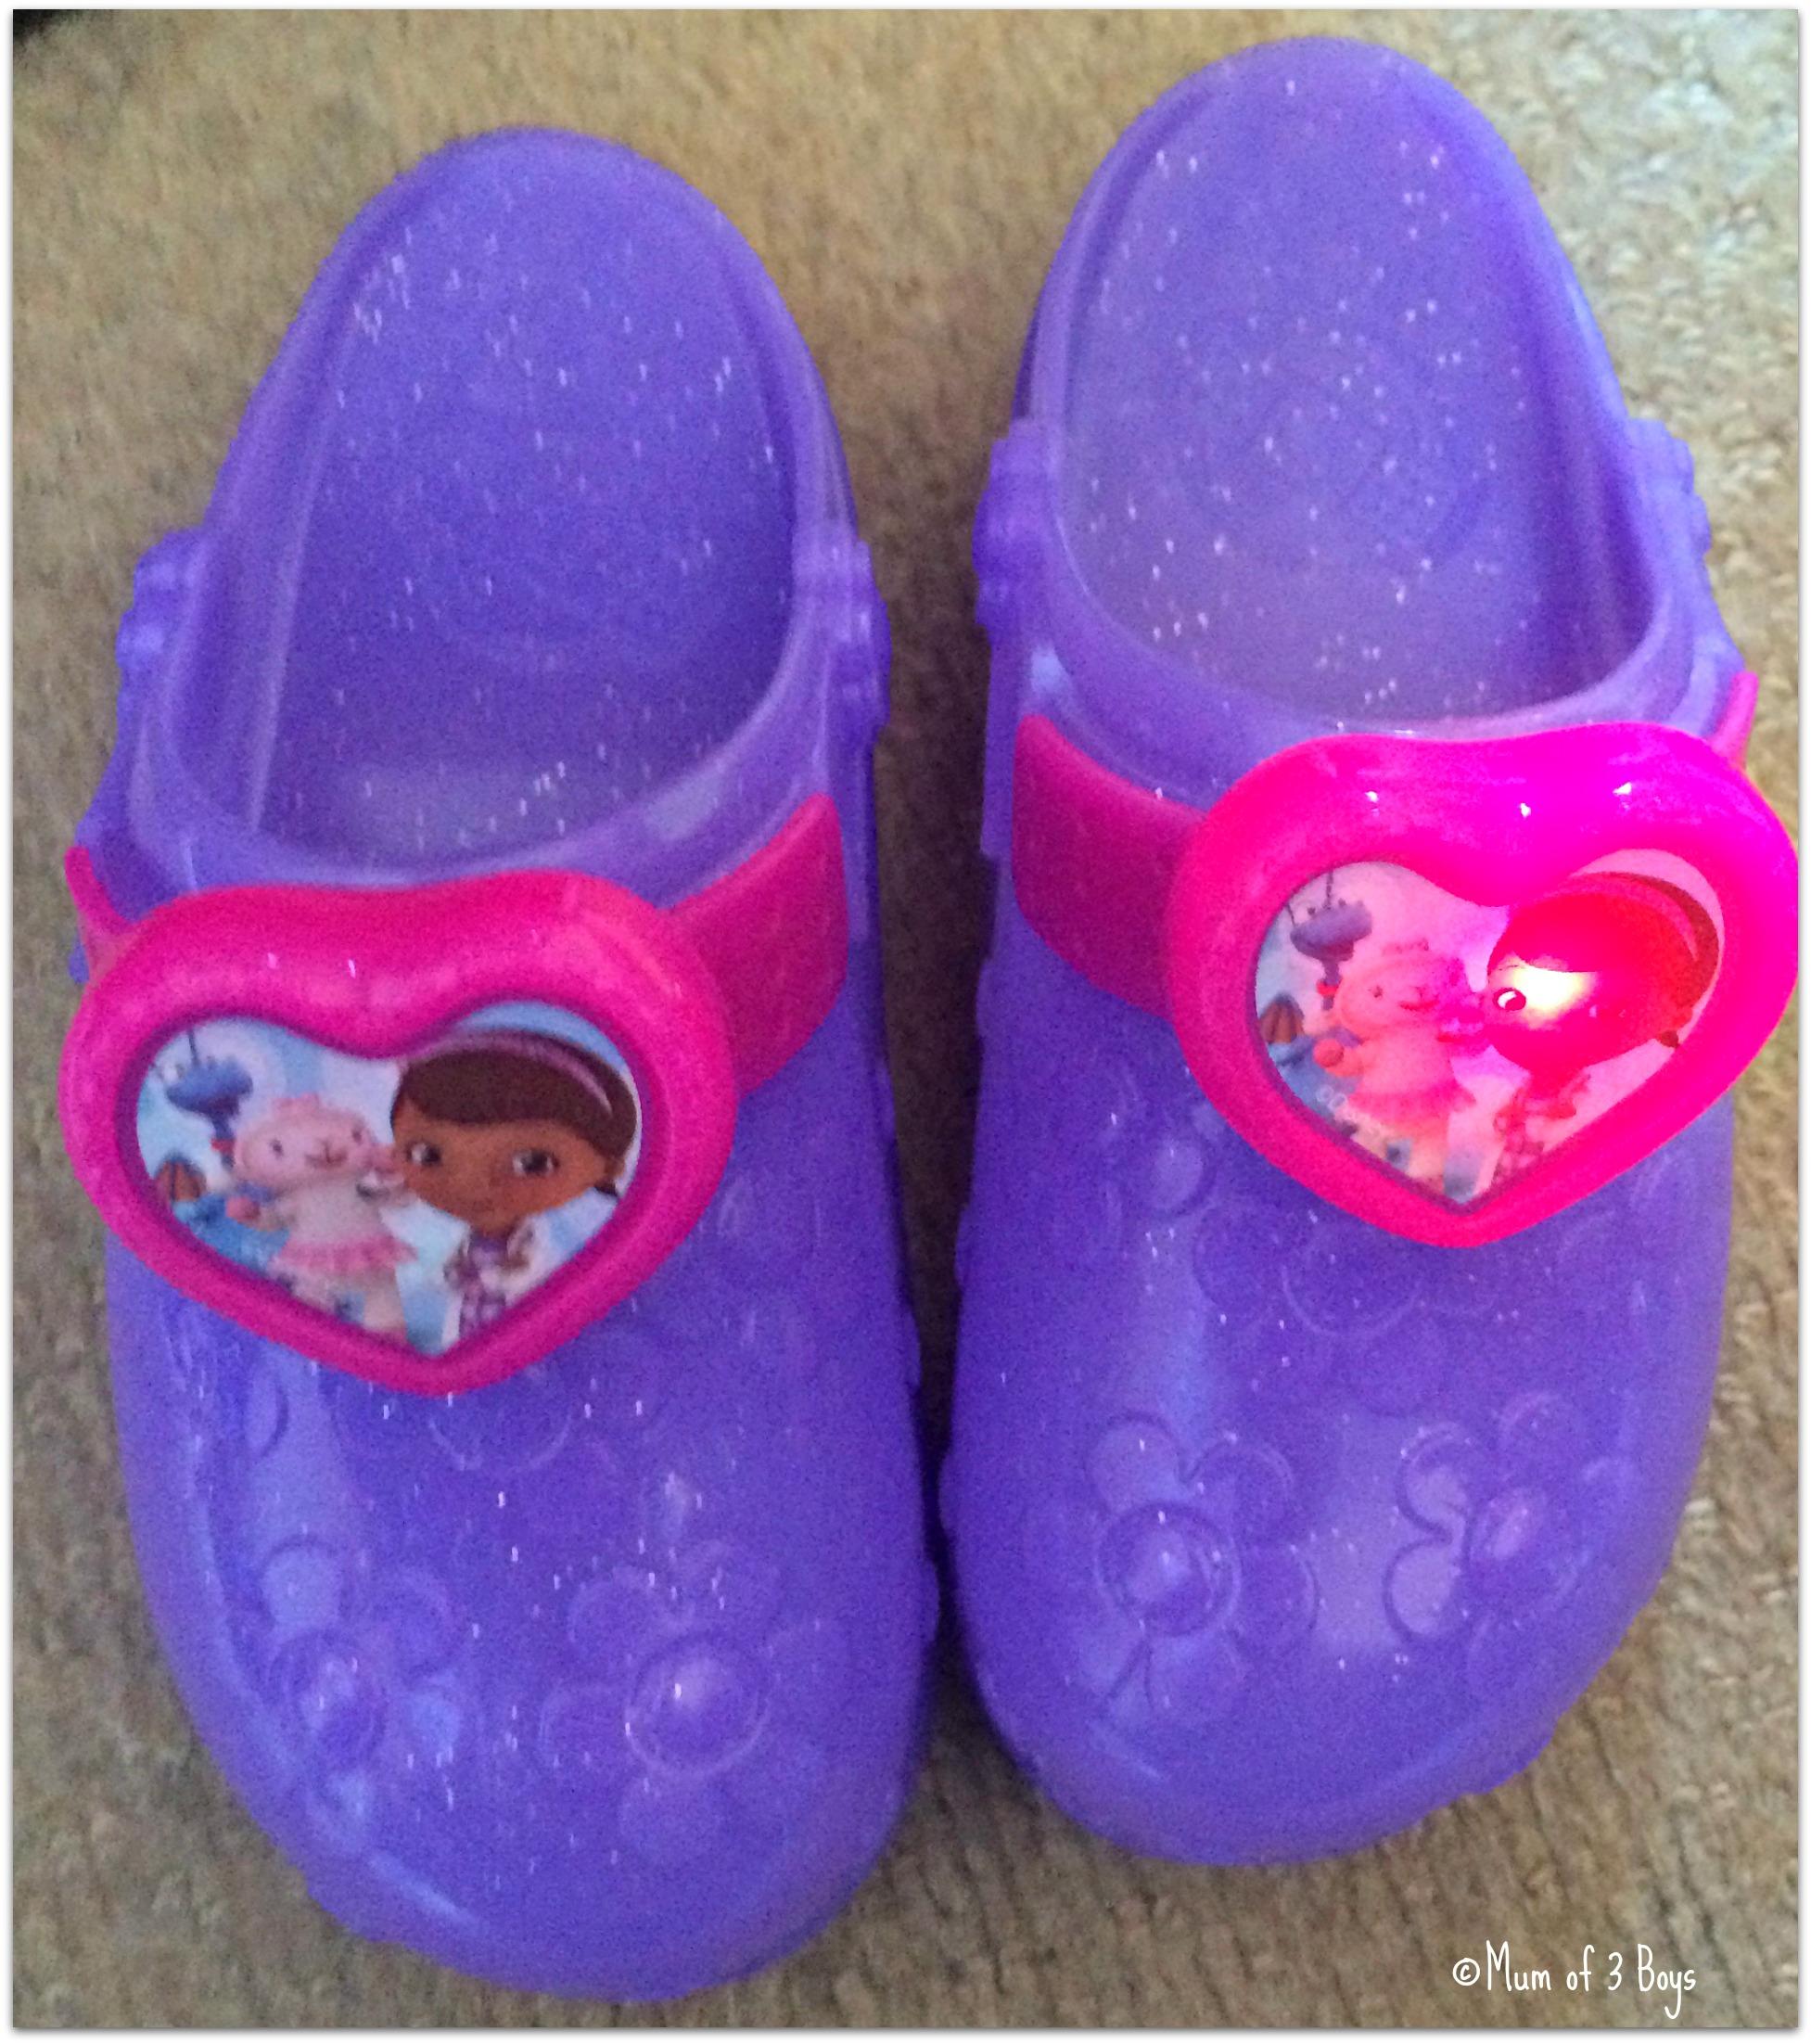 Review – Doc McStuffins Light Up Doctor Shoes – Mum of 3 Boys